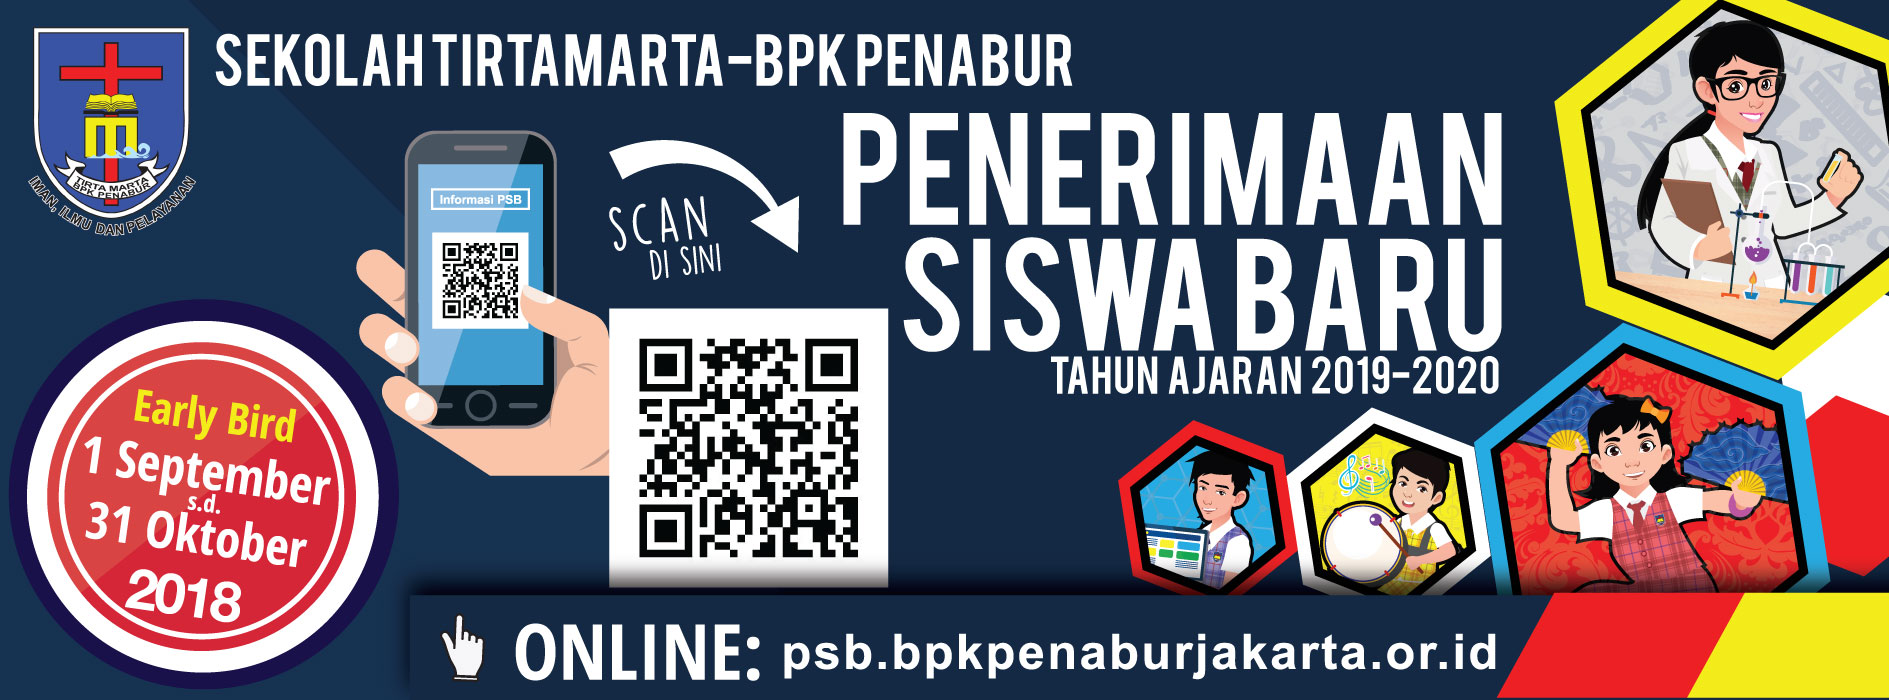 PENERIMAAN SISWA BARU 2019 2020 SEKOLAH TIRTAMARTA BPK PENABUR PONDOK INDAH DEPOK CINERE ONLINE EARLY BIRD